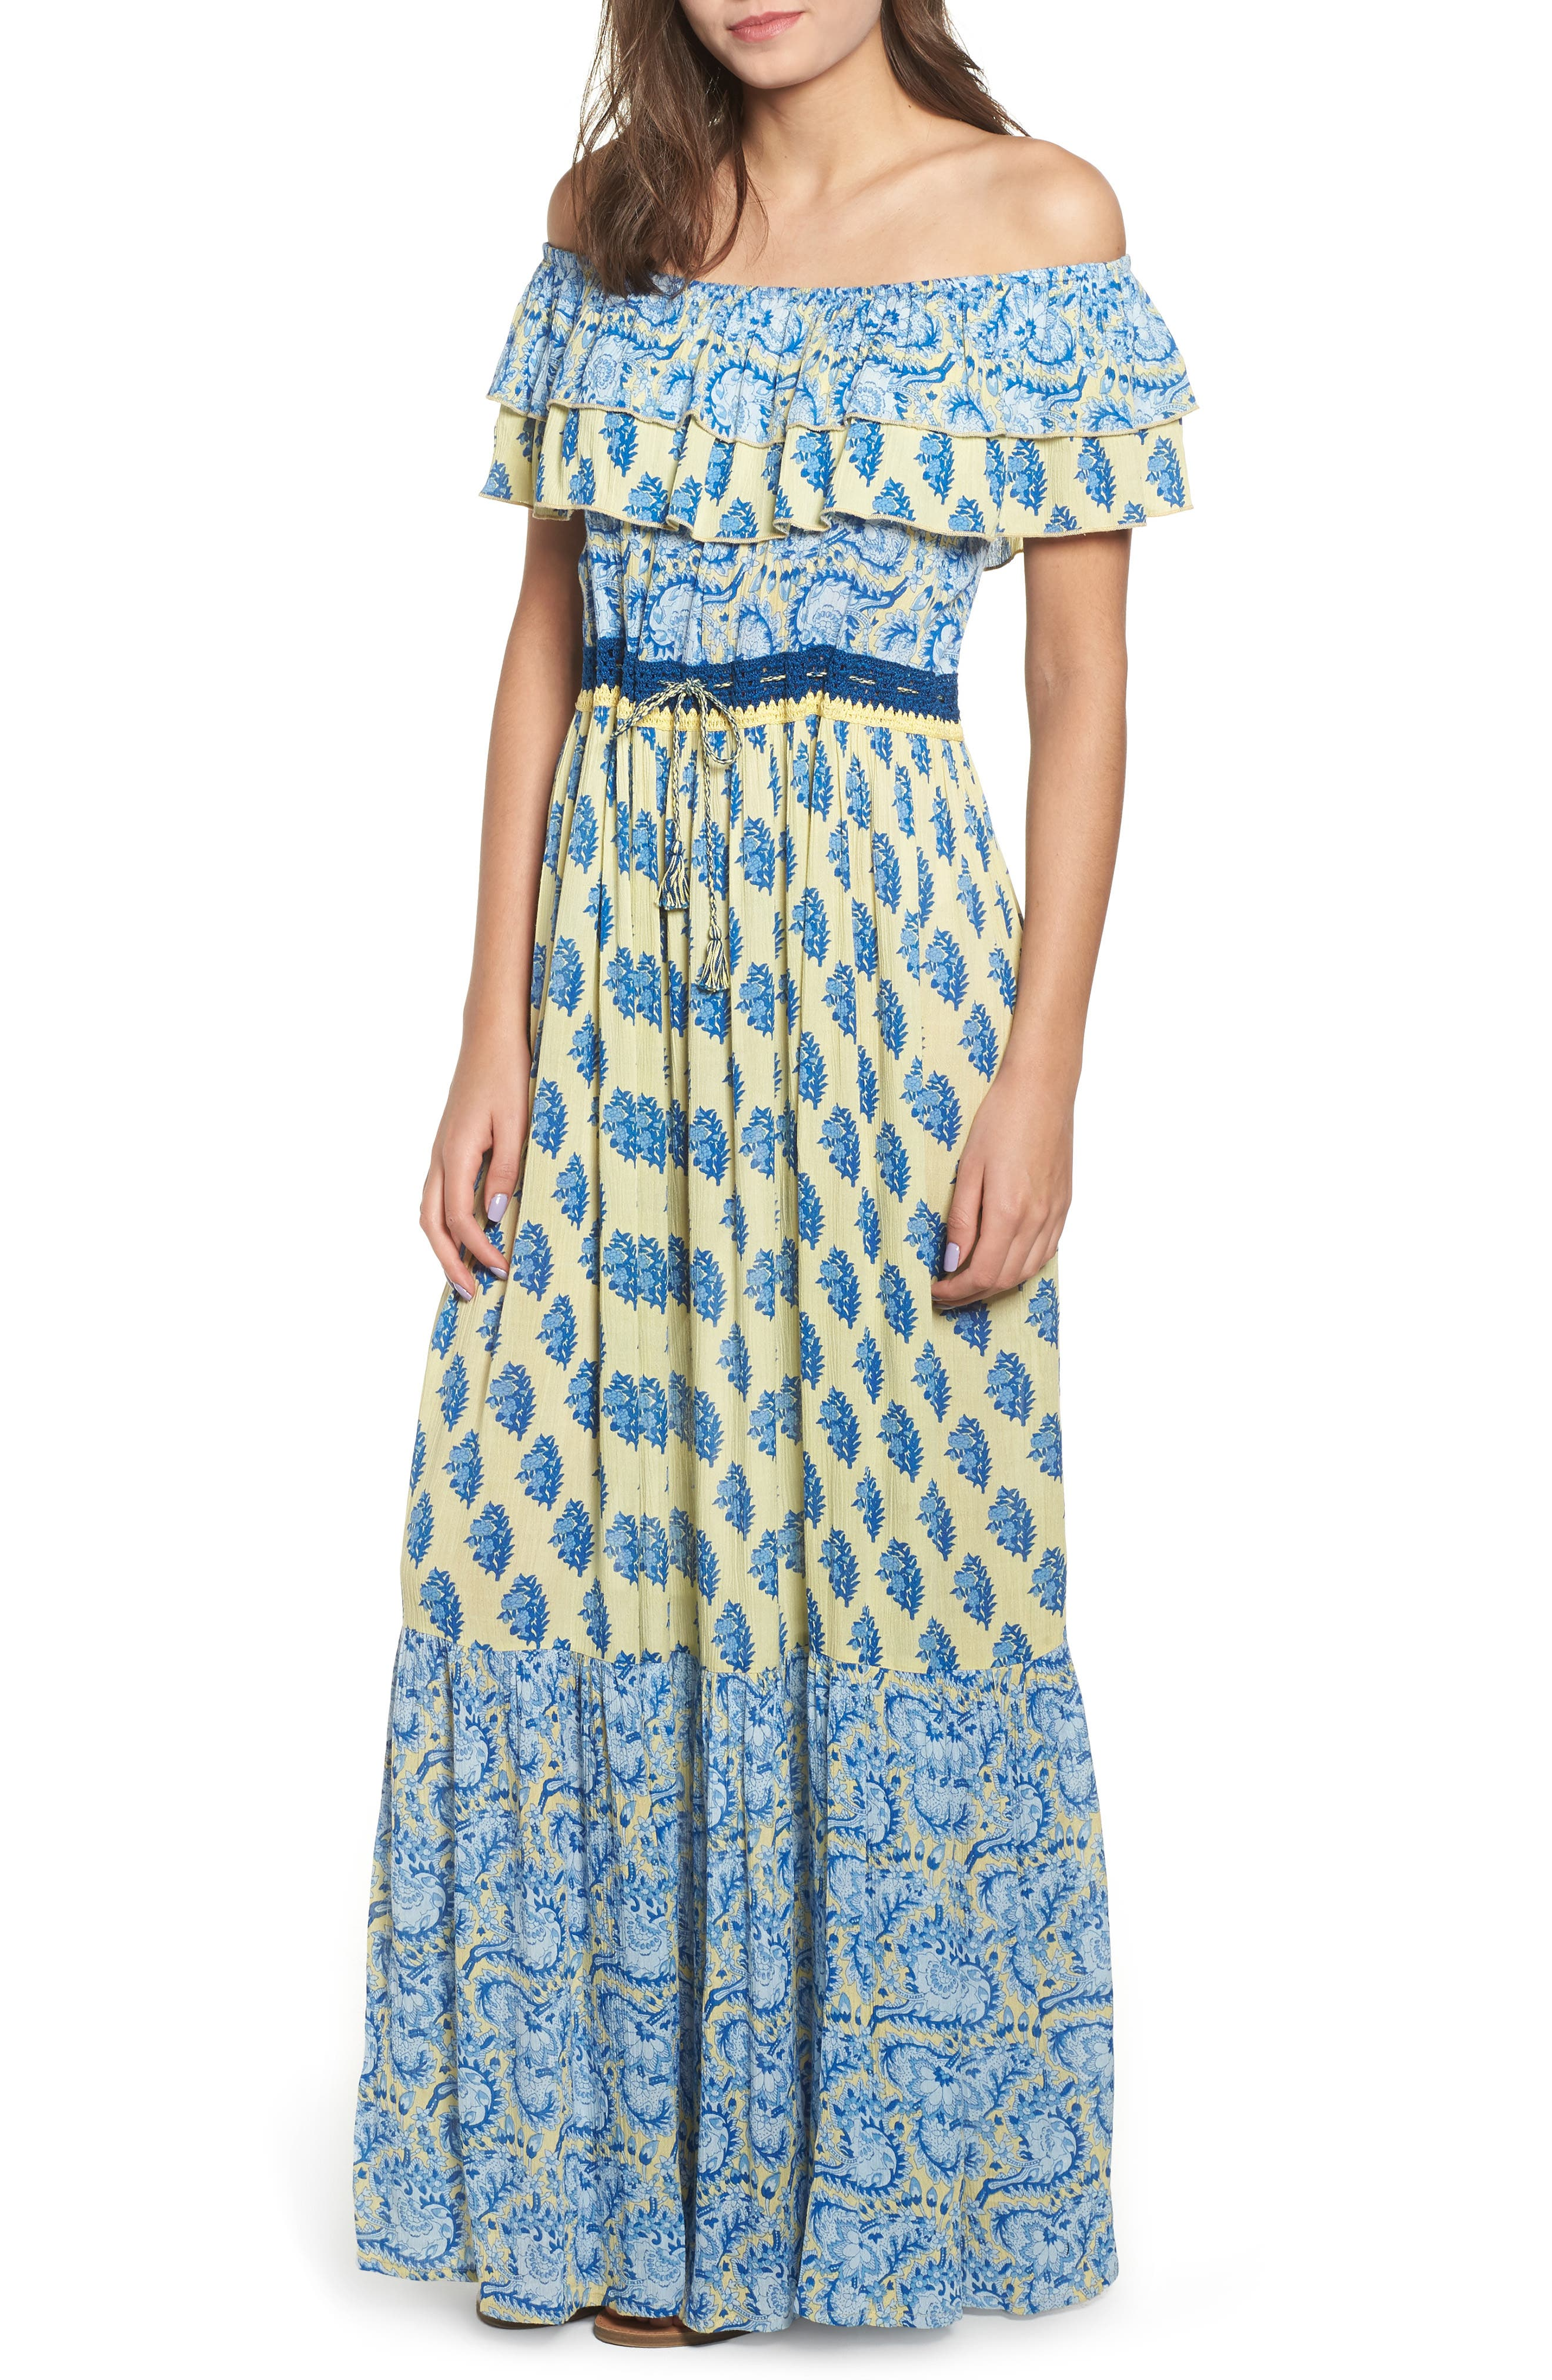 Sunlit Daze Off The Shoulder Maxi Dress, Yellow